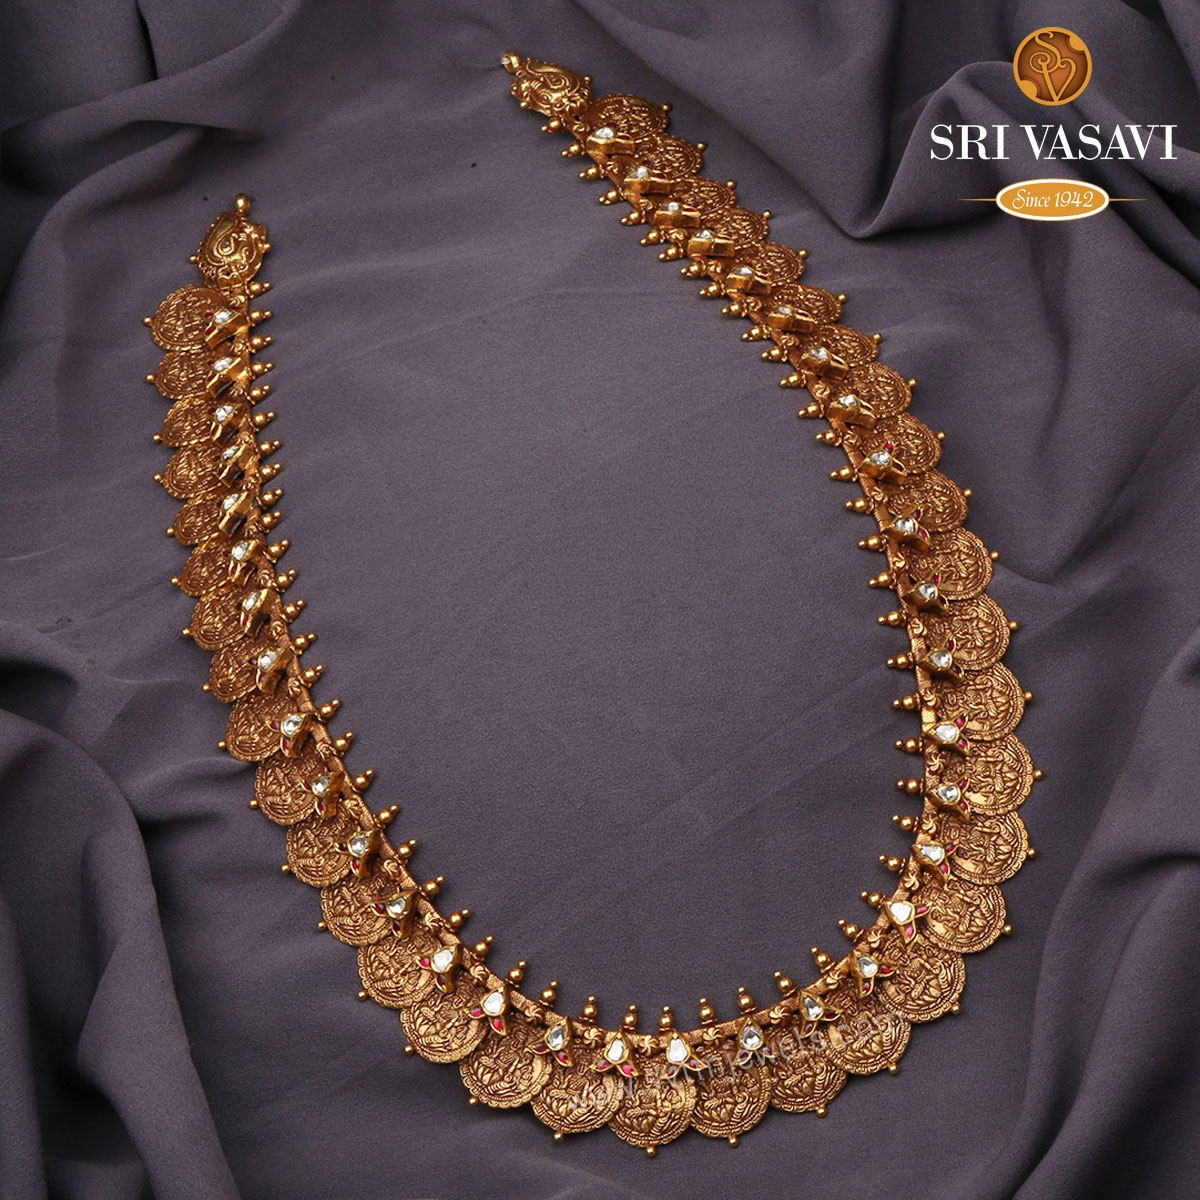 Kanti Antique Kaasu Necklace